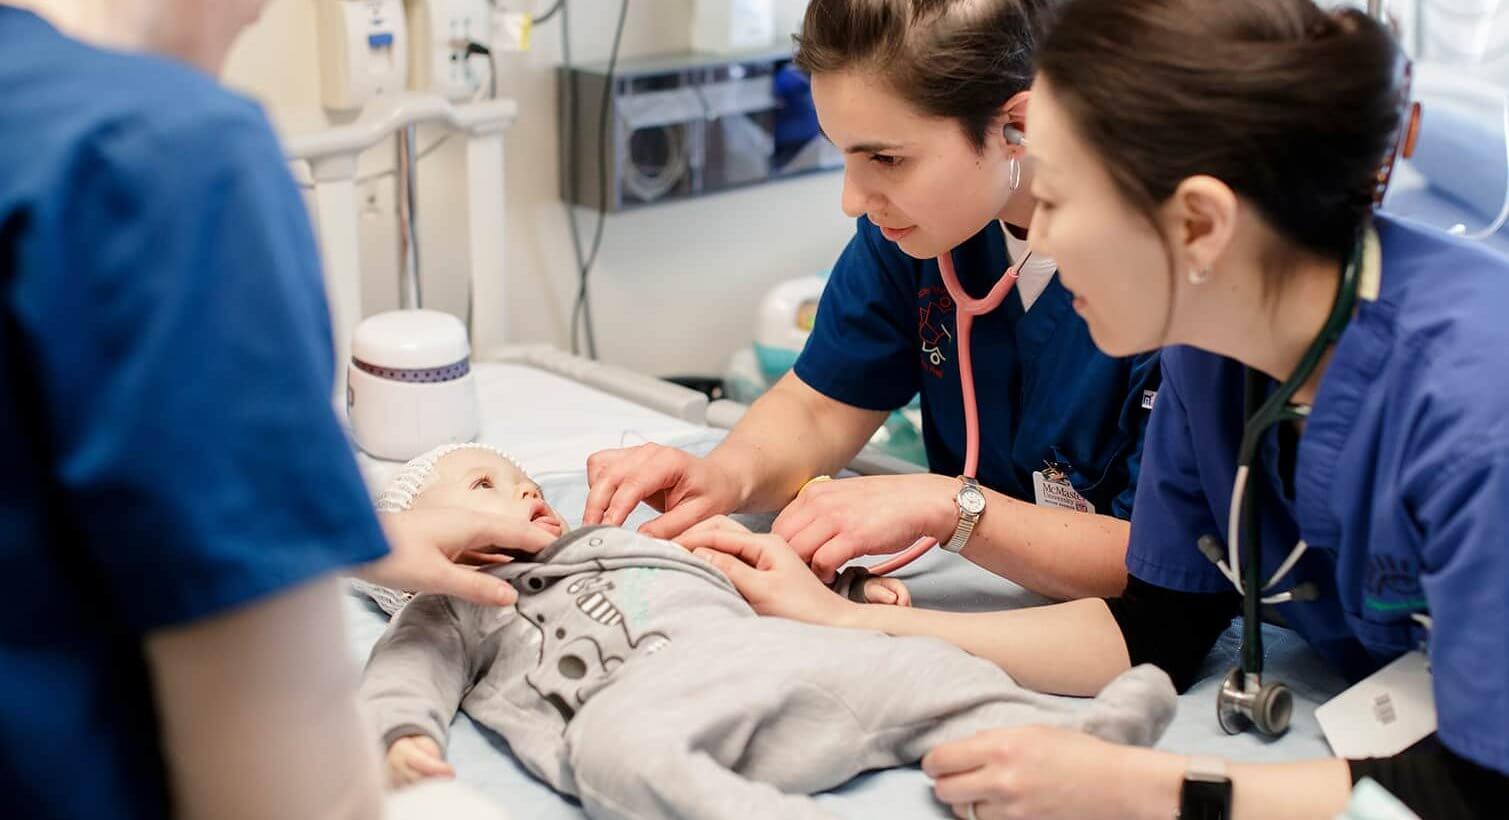 Three nurses examining a baby at the McMaster Children's hospital